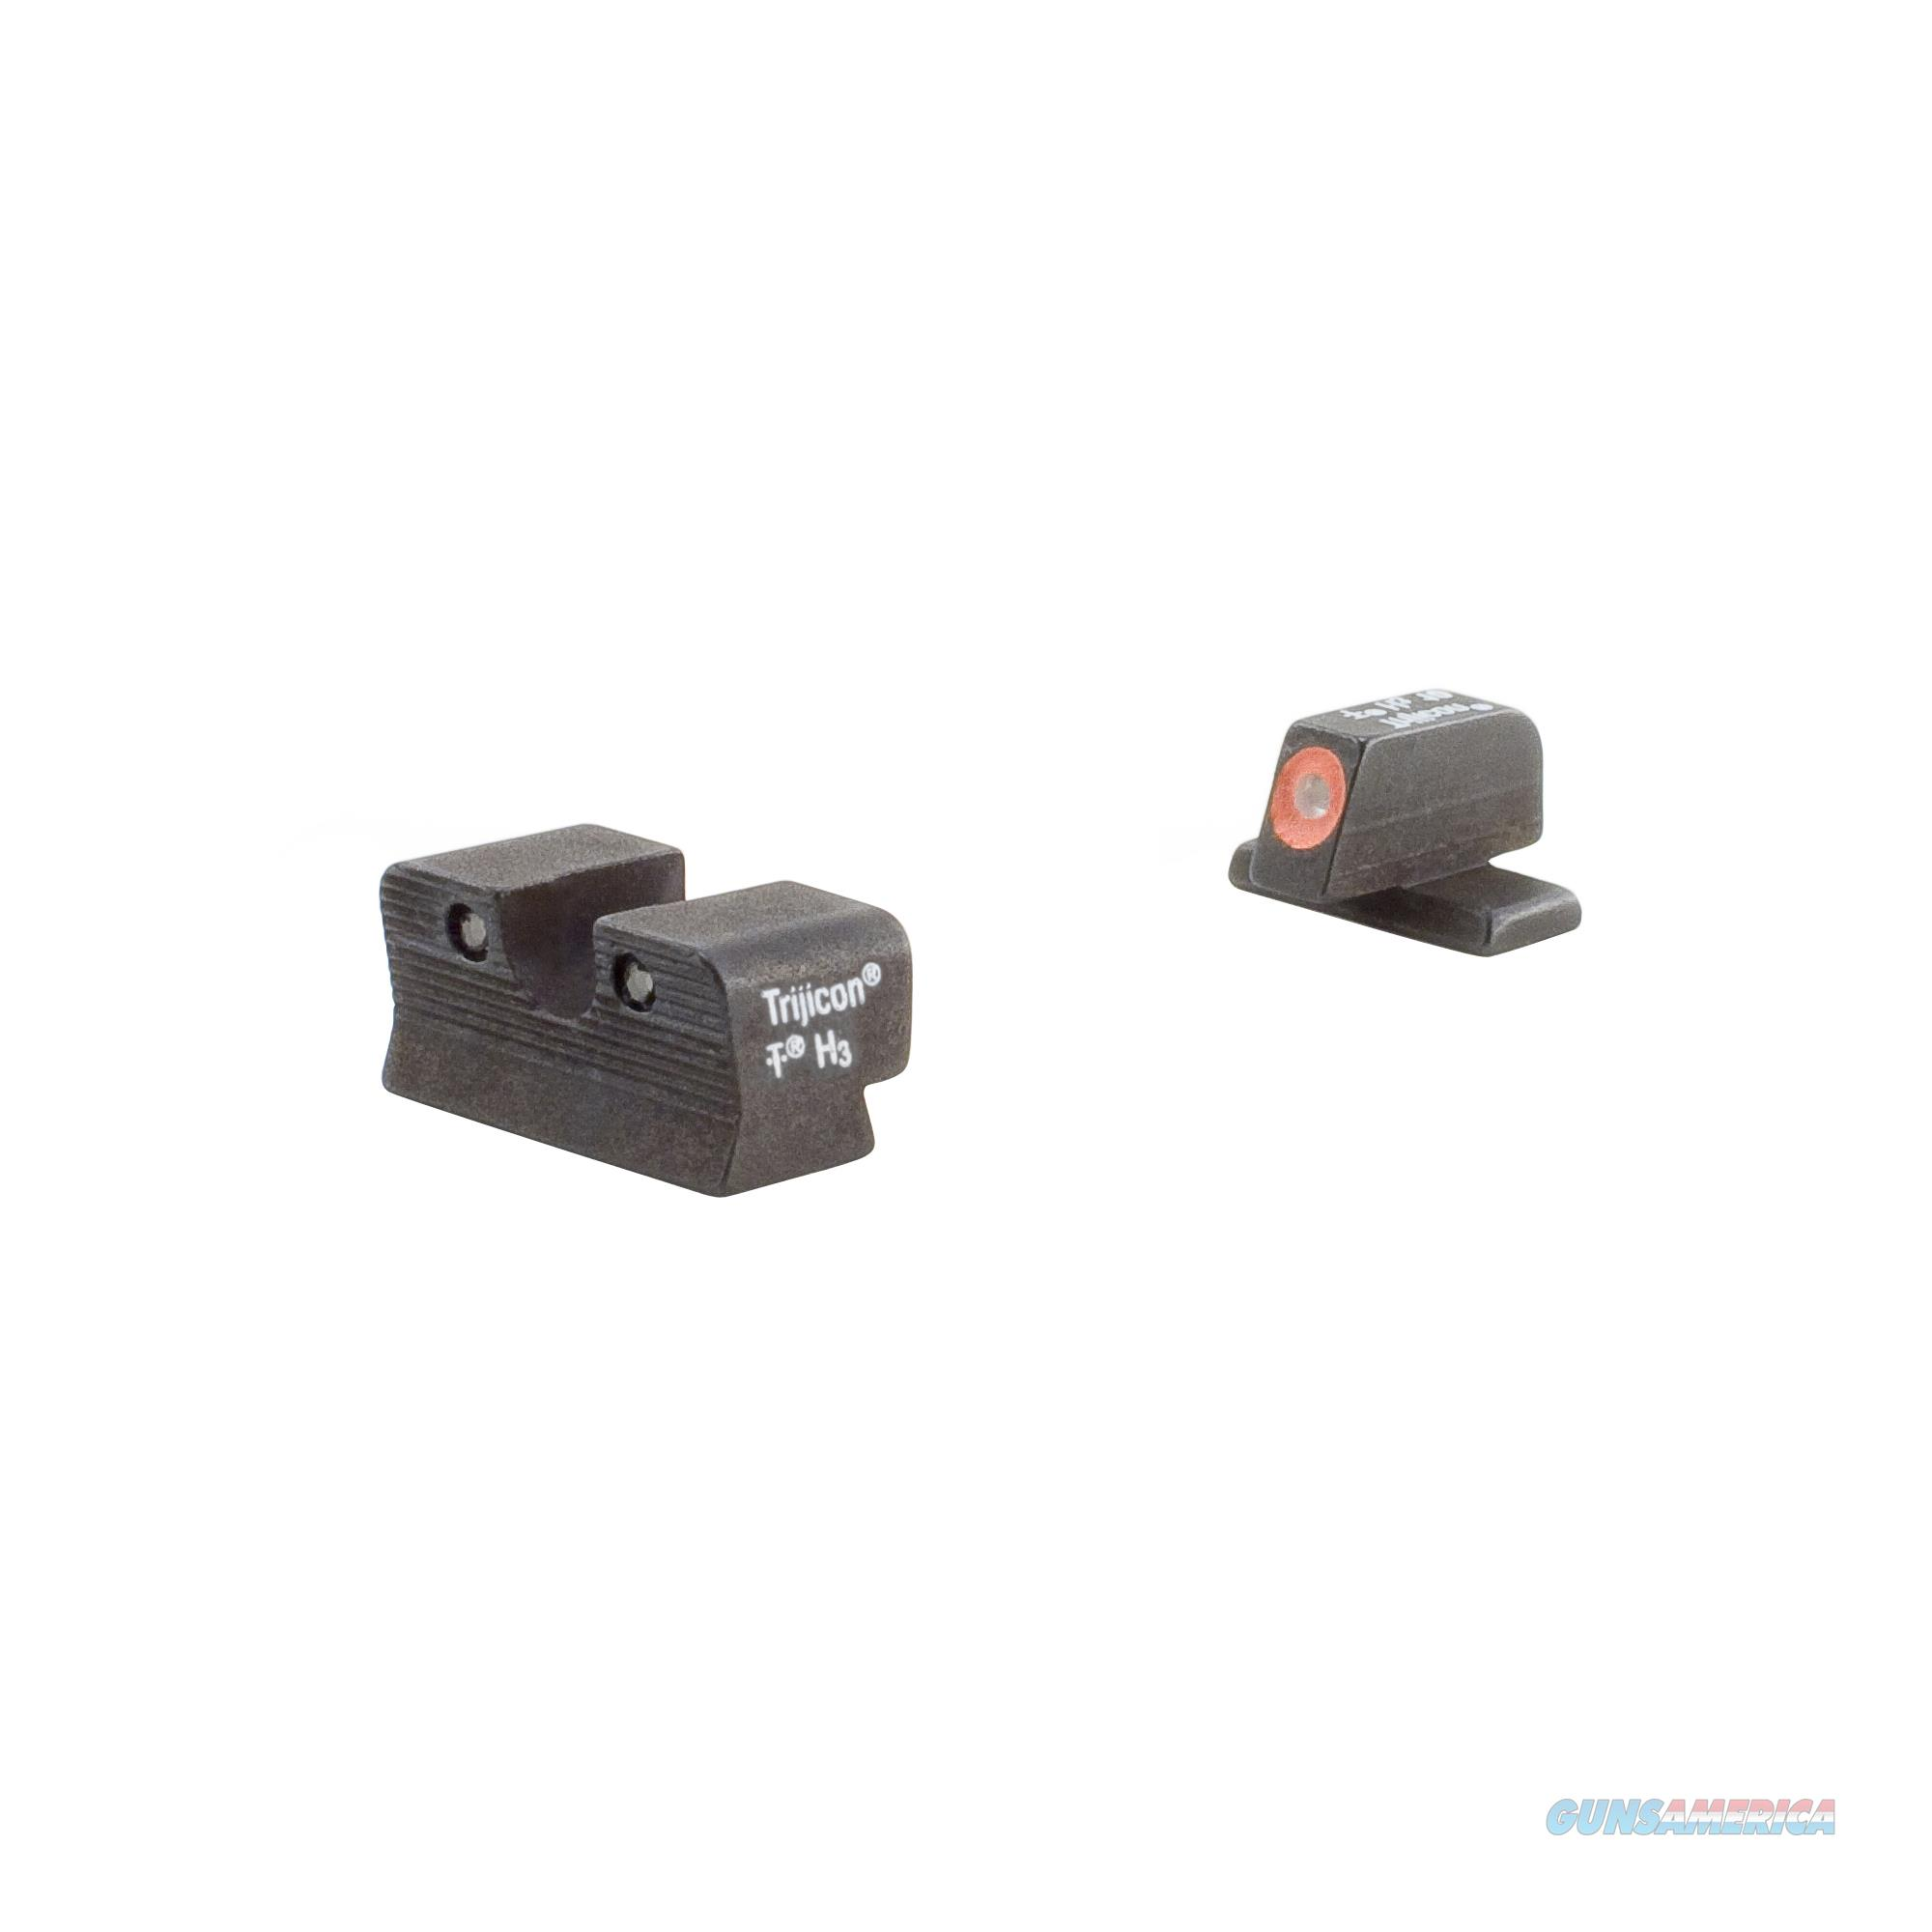 Trius Products Sig Sauer Hd Night Sight Set SG101O  Non-Guns > Iron/Metal/Peep Sights